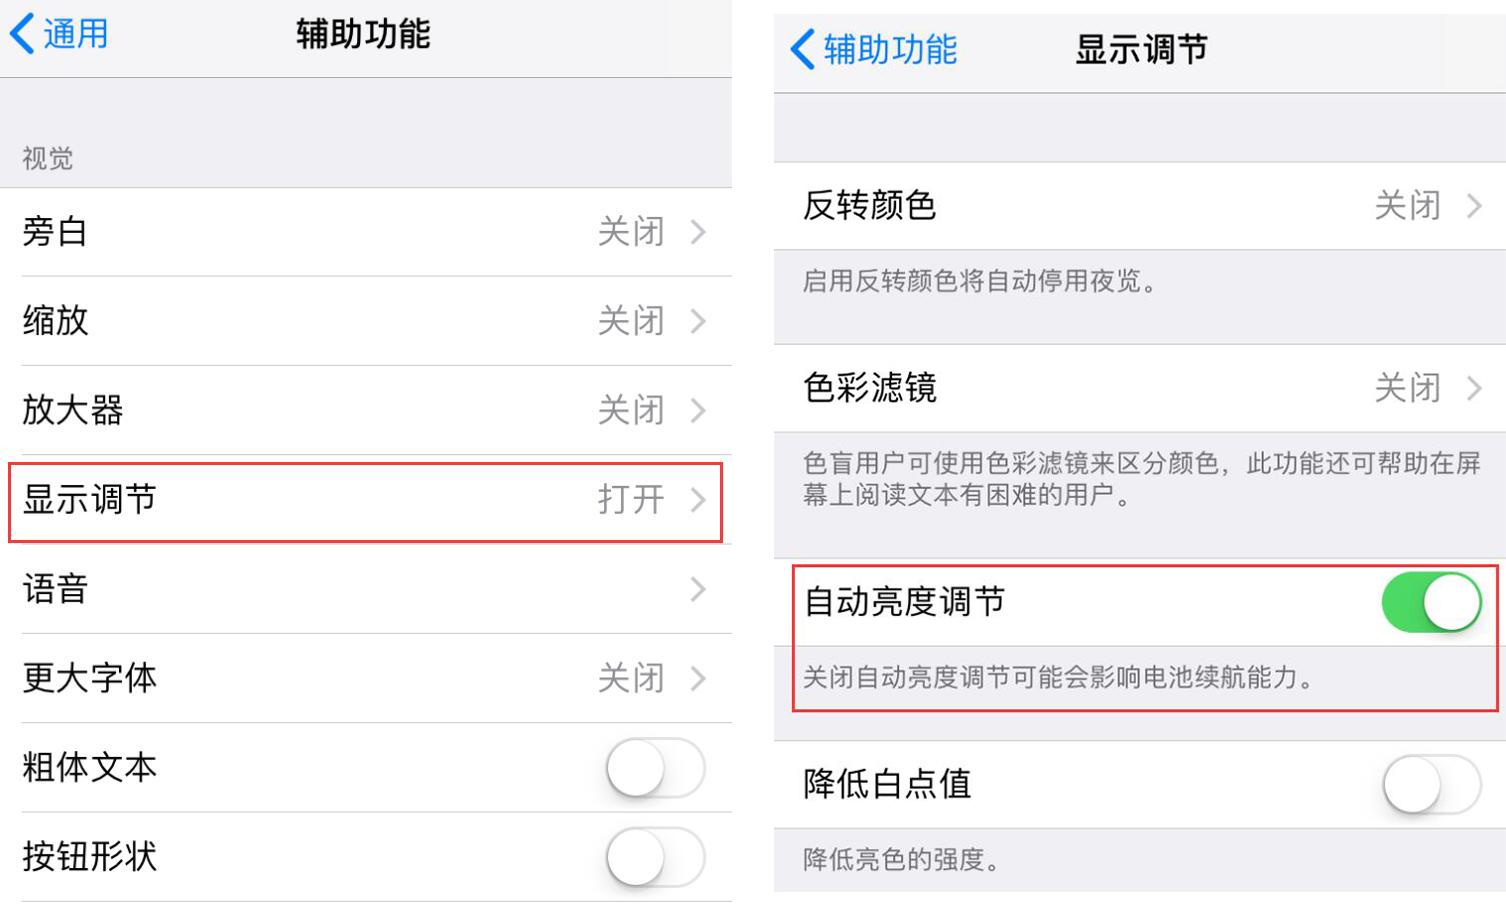 iOS 12自动亮度调节功能在哪?